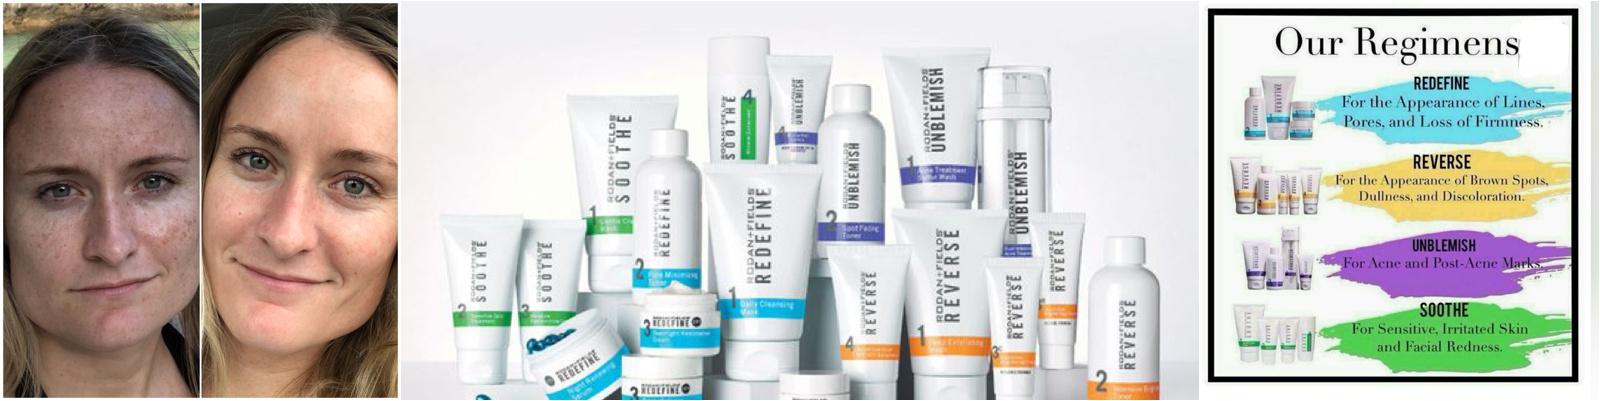 skin care transformation.jpg